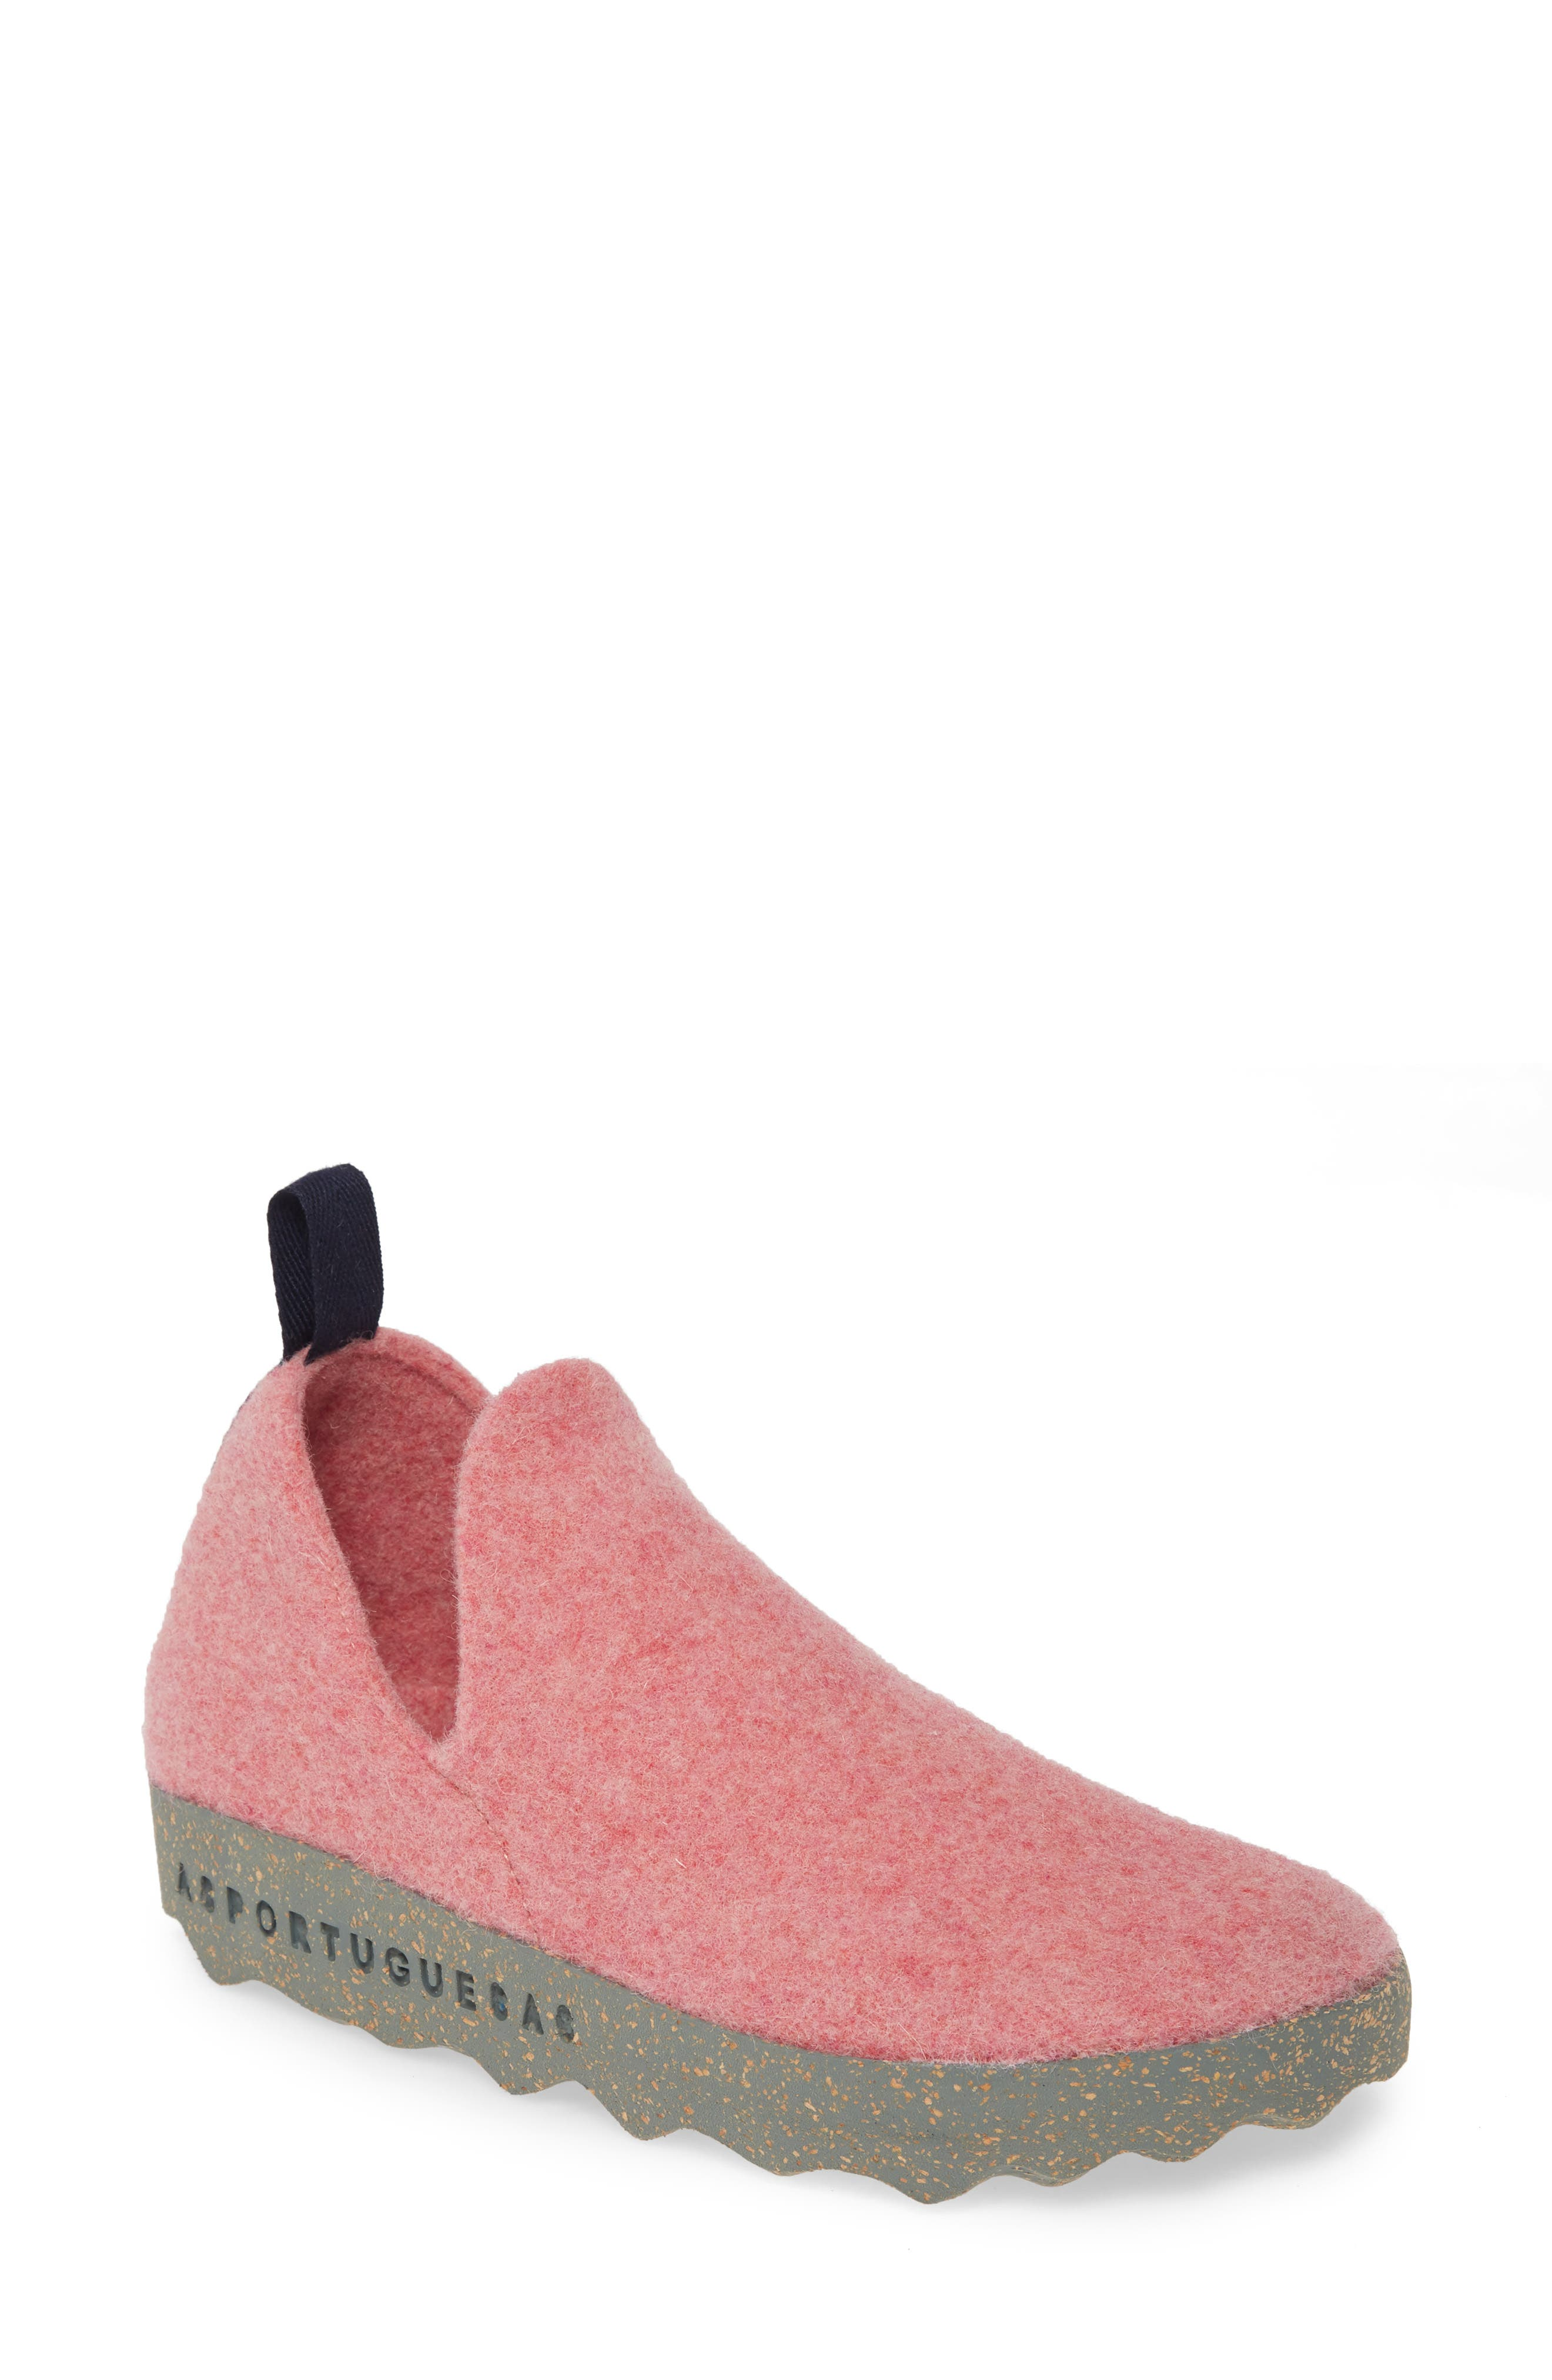 Asportuguesas By Fly London City Sneaker, Pink